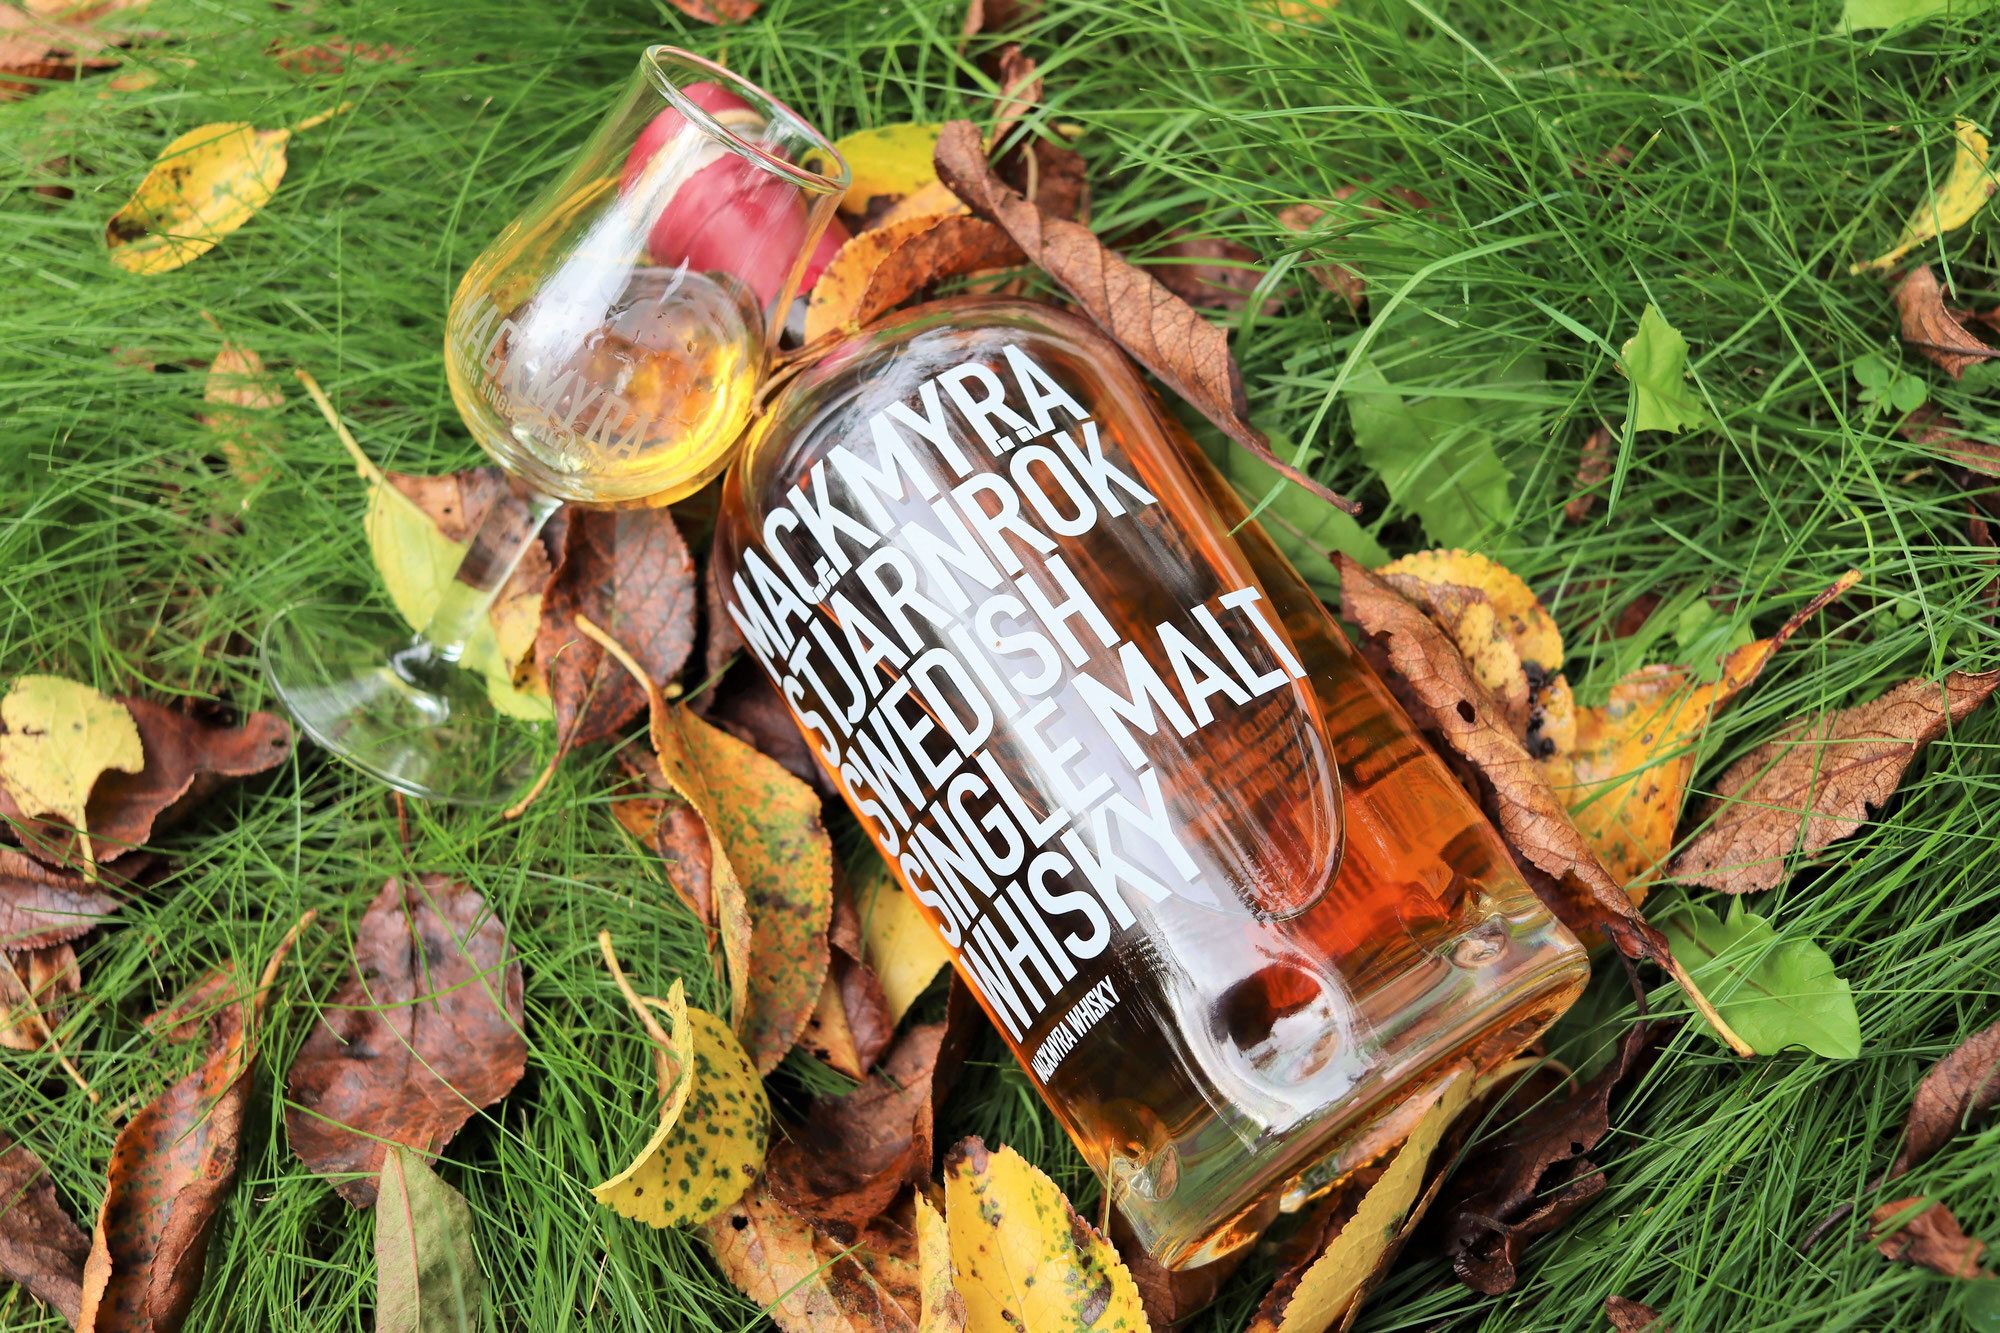 Whiskybesprechung #208: Mackmyra Stjärnrök